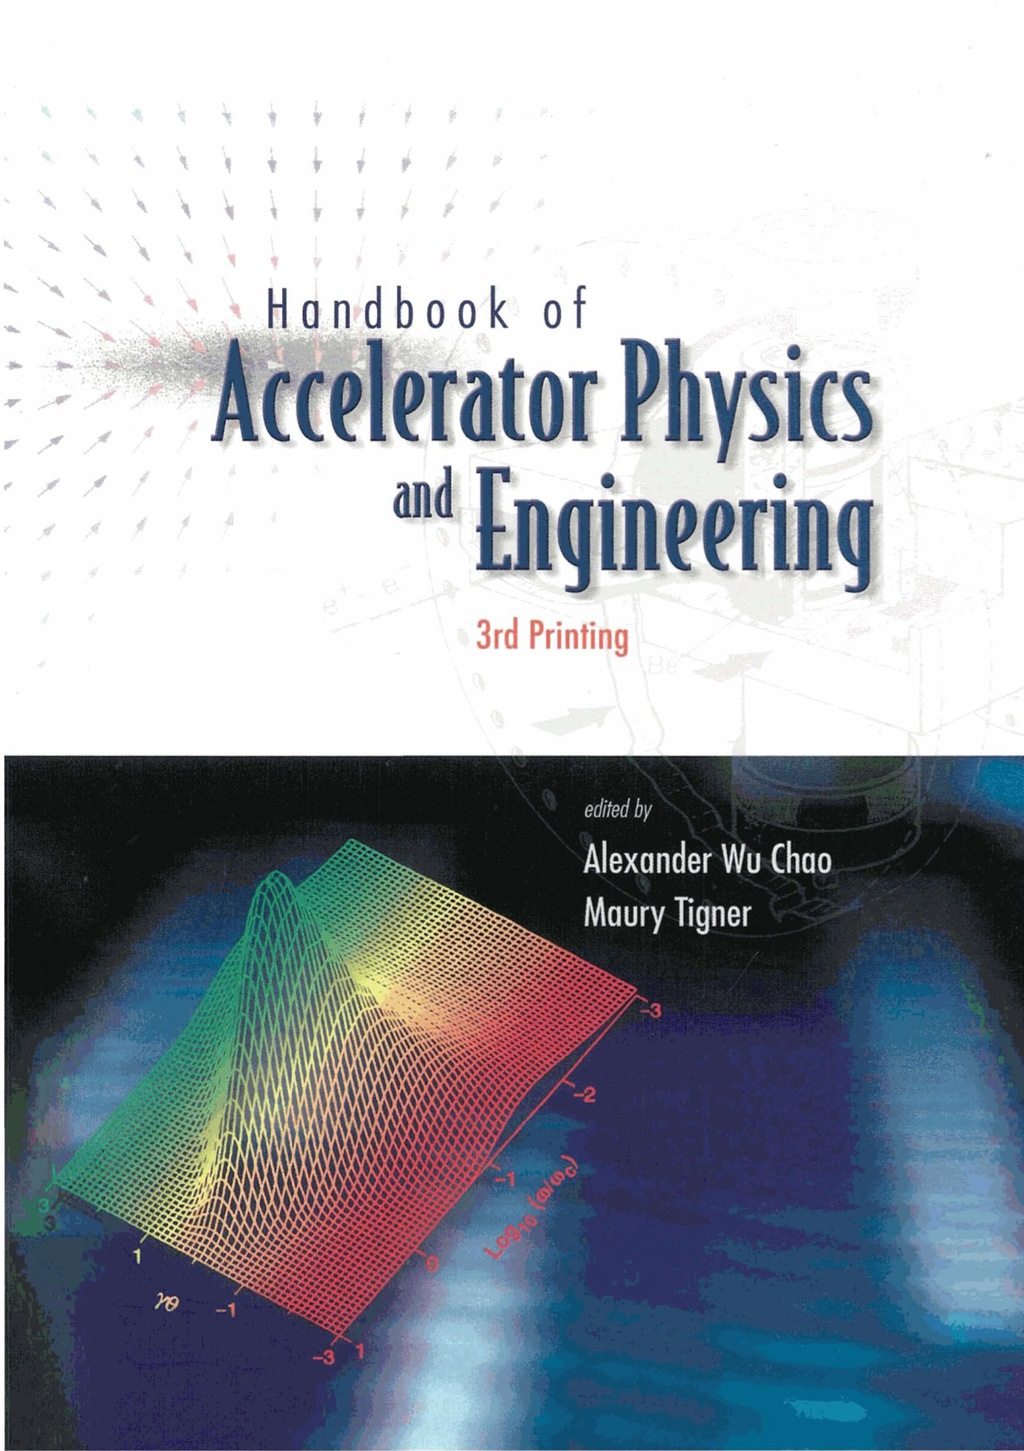 Handbook Of Accelerator Physics And Engineering (3rd Printing) (ebook)